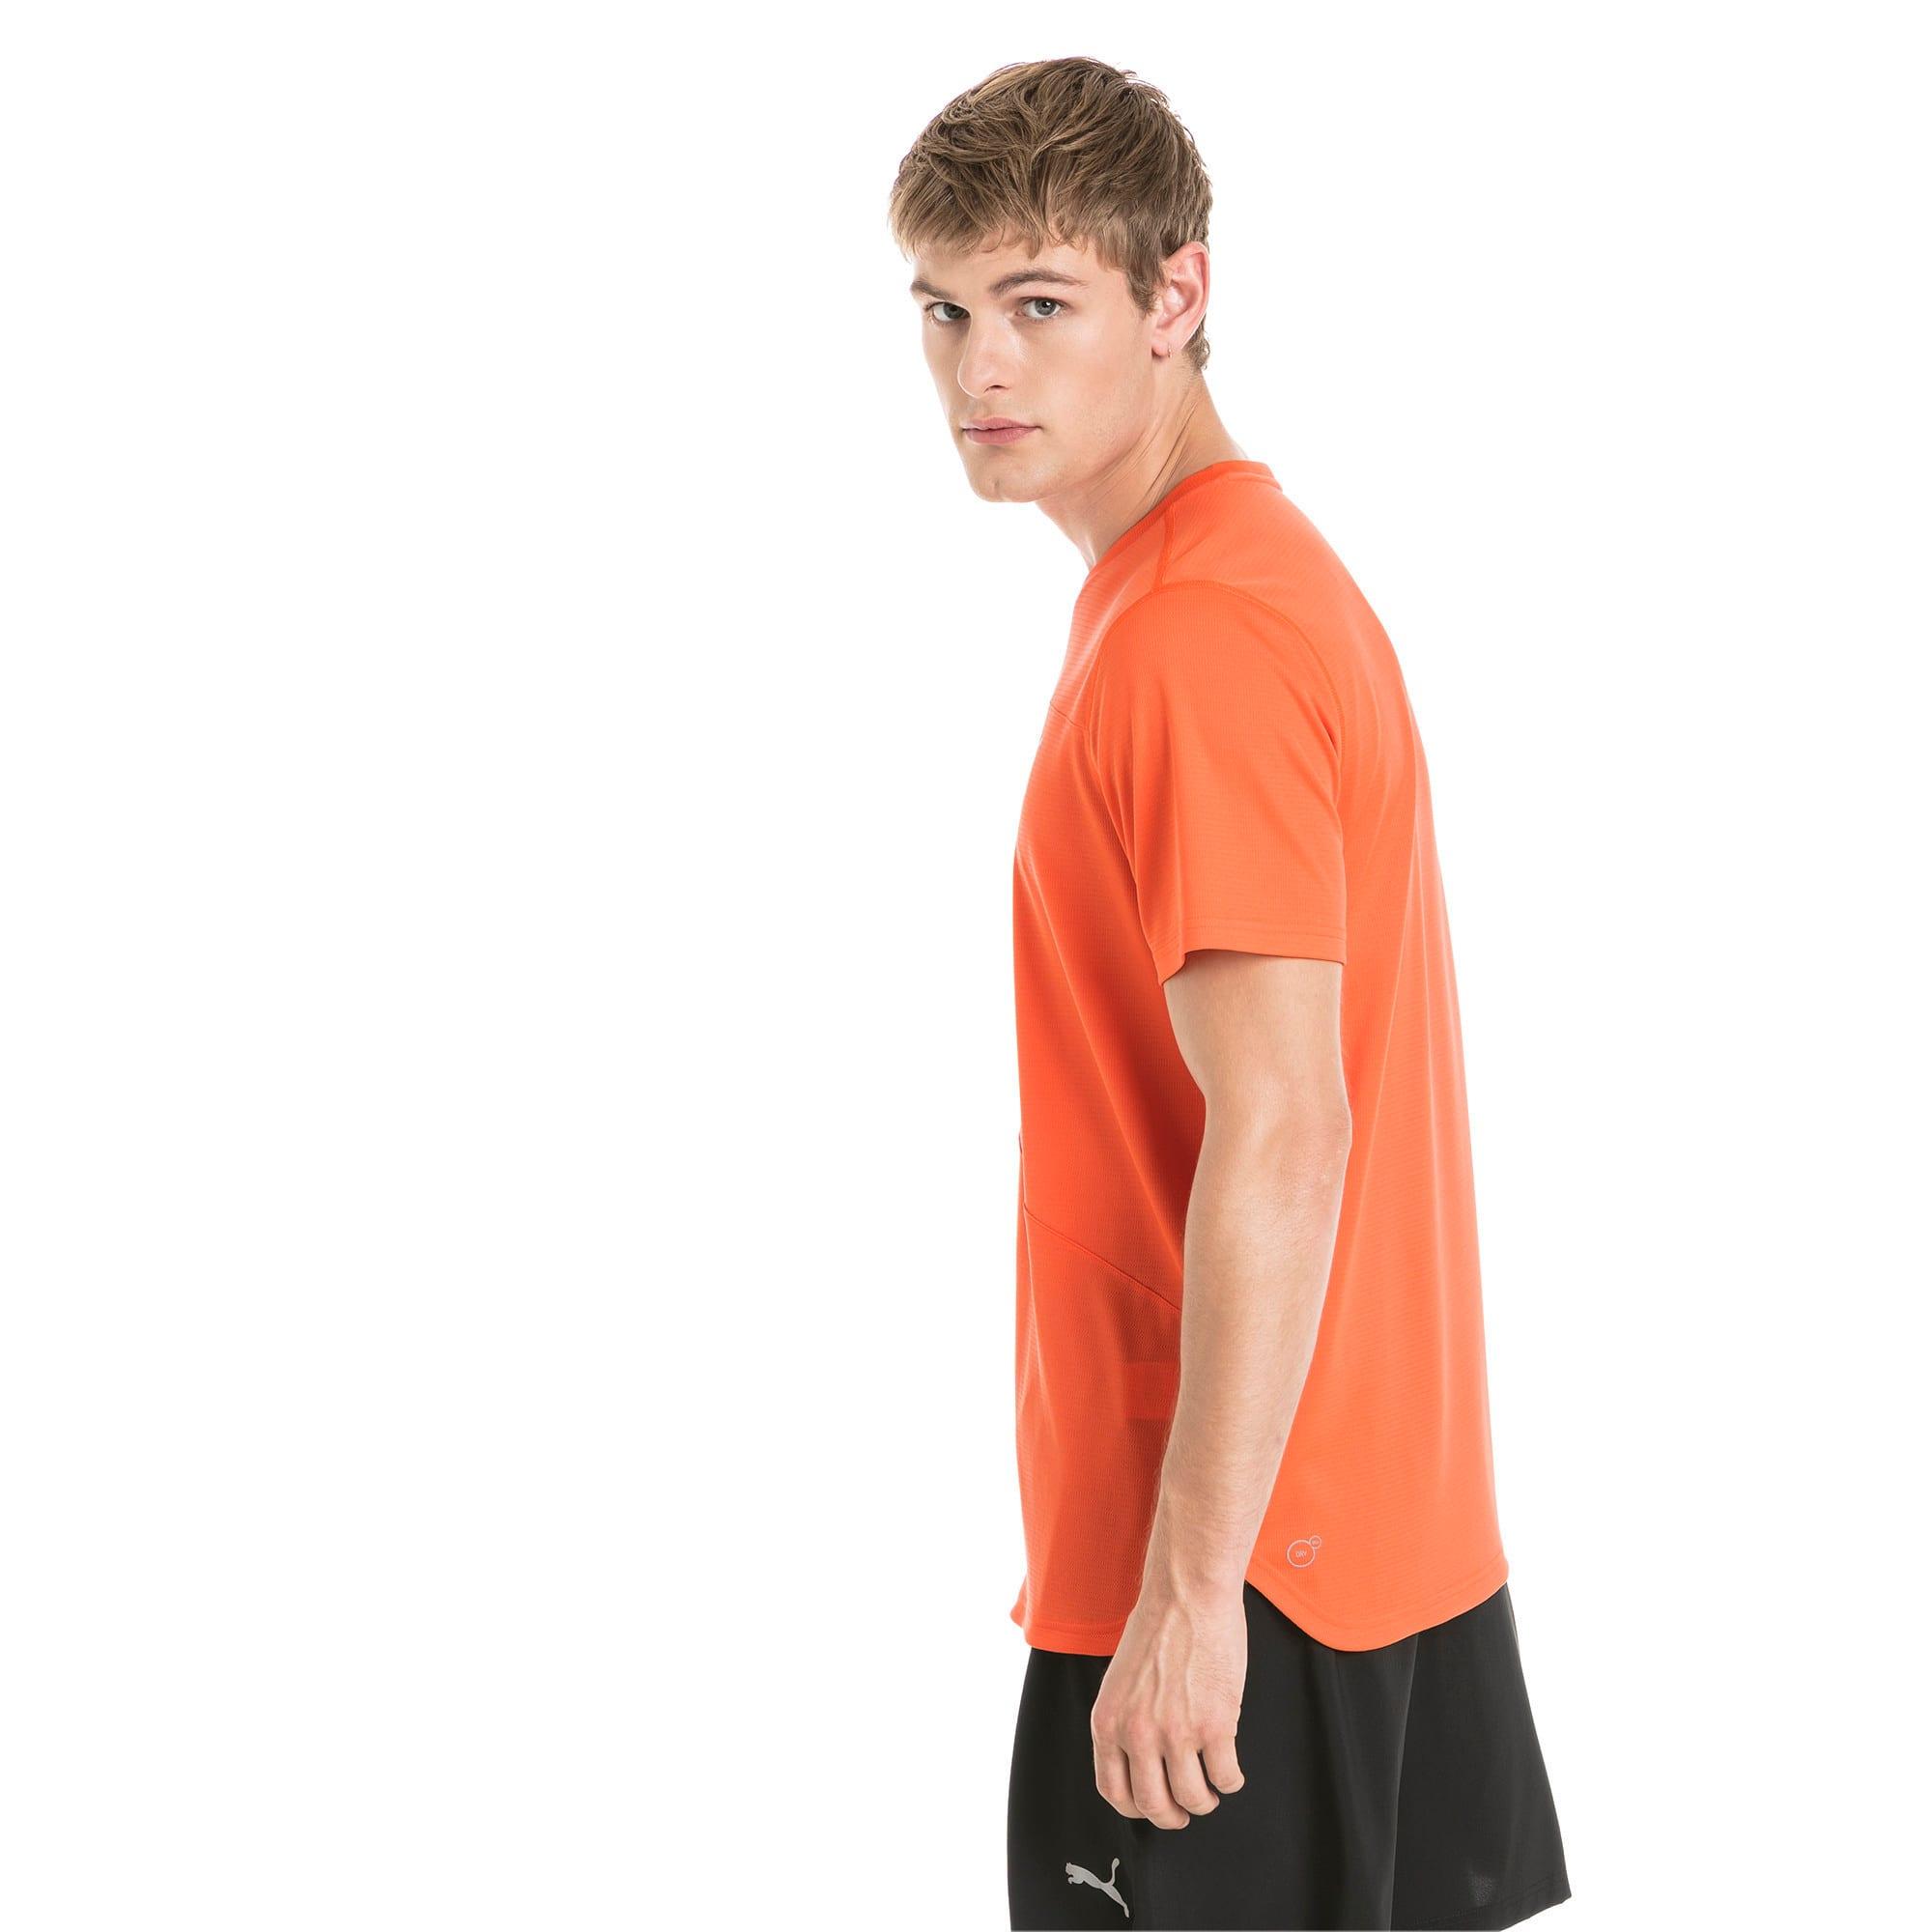 Thumbnail 2 of Running Men's IGNITE Mono T-Shirt, Firecracker, medium-IND